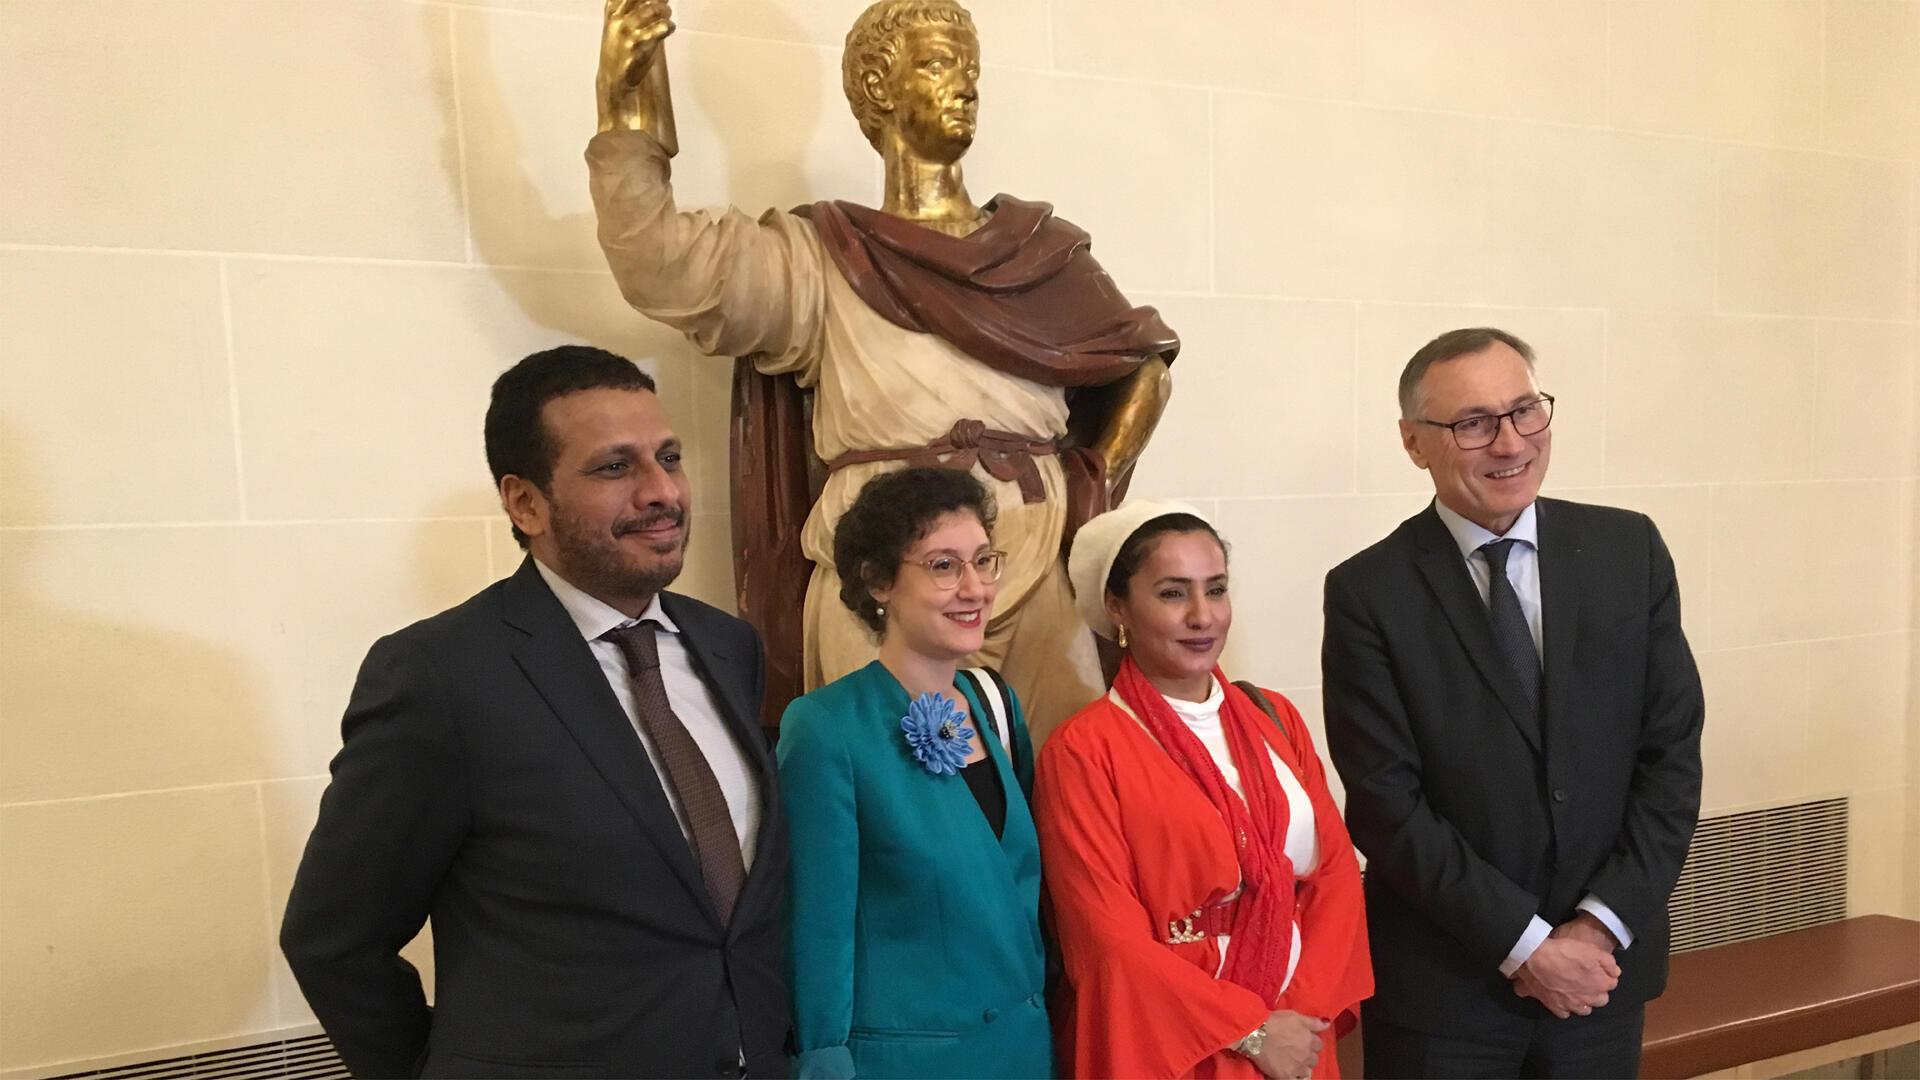 L'ambassadeur d'Oman, Yara El Ghafri, Mona Al Baiti et Jean-Marie Bockel.